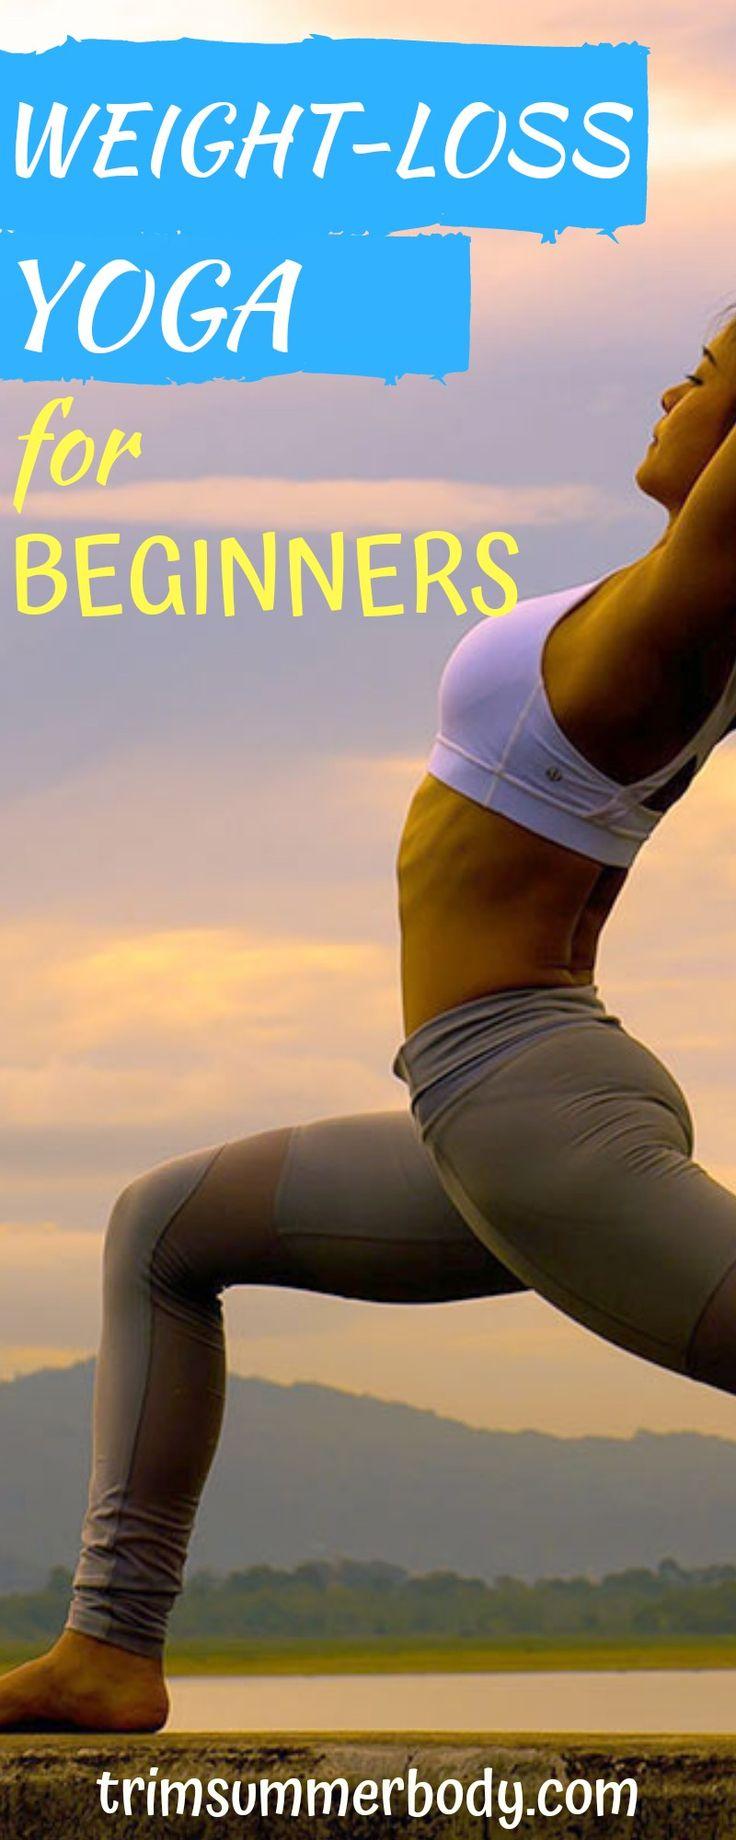 Weightloss yoga for beginners